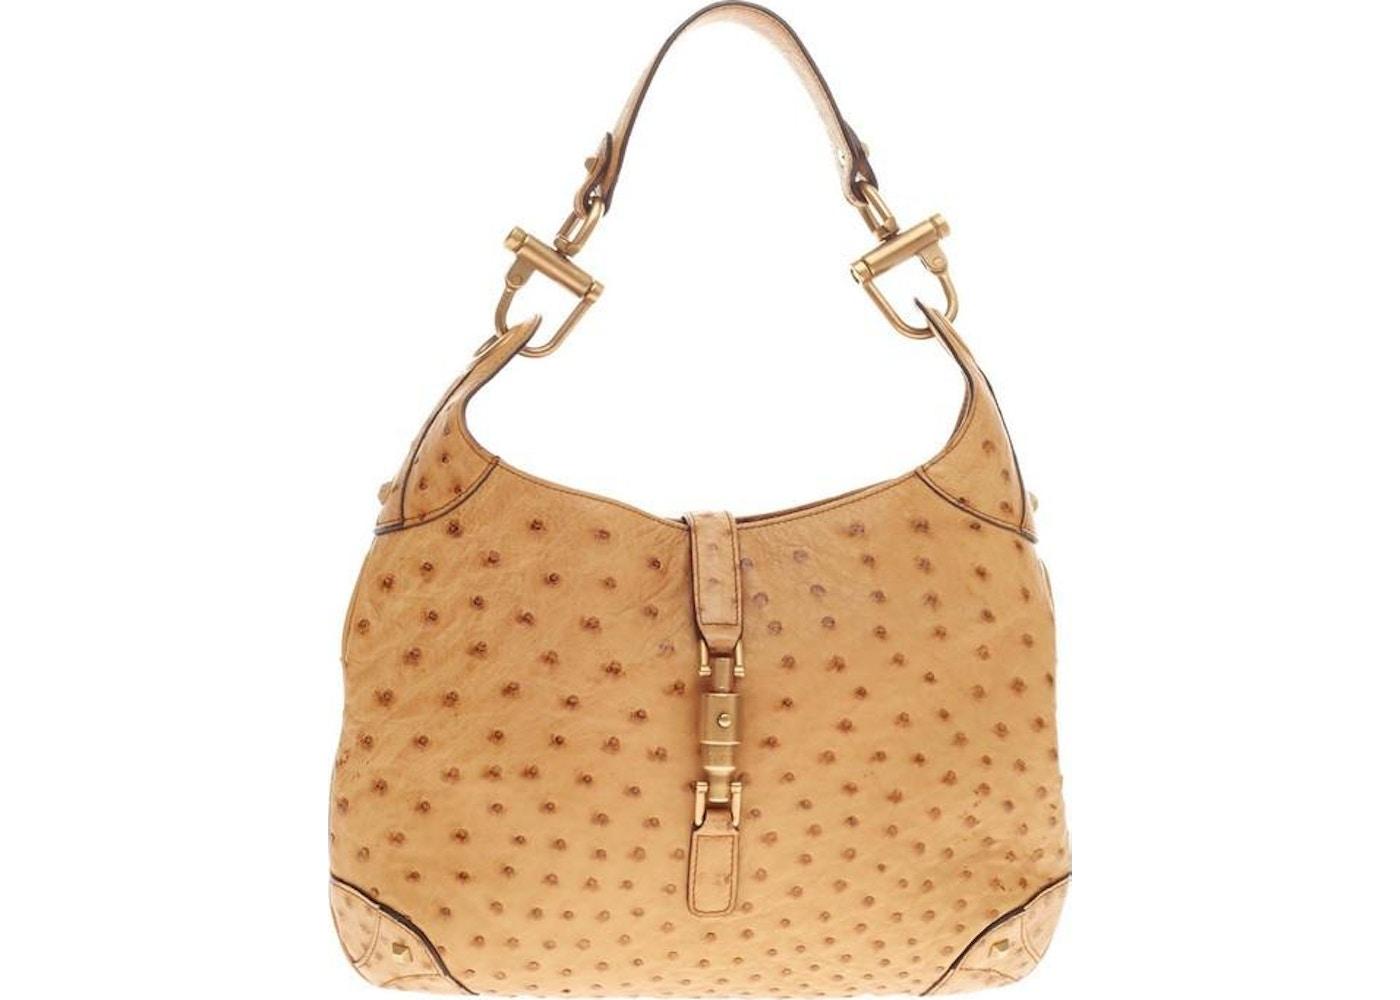 644c94f27 Gucci Jackie O Handbag GG Piston-Lock Closure Medium Sandy Tan